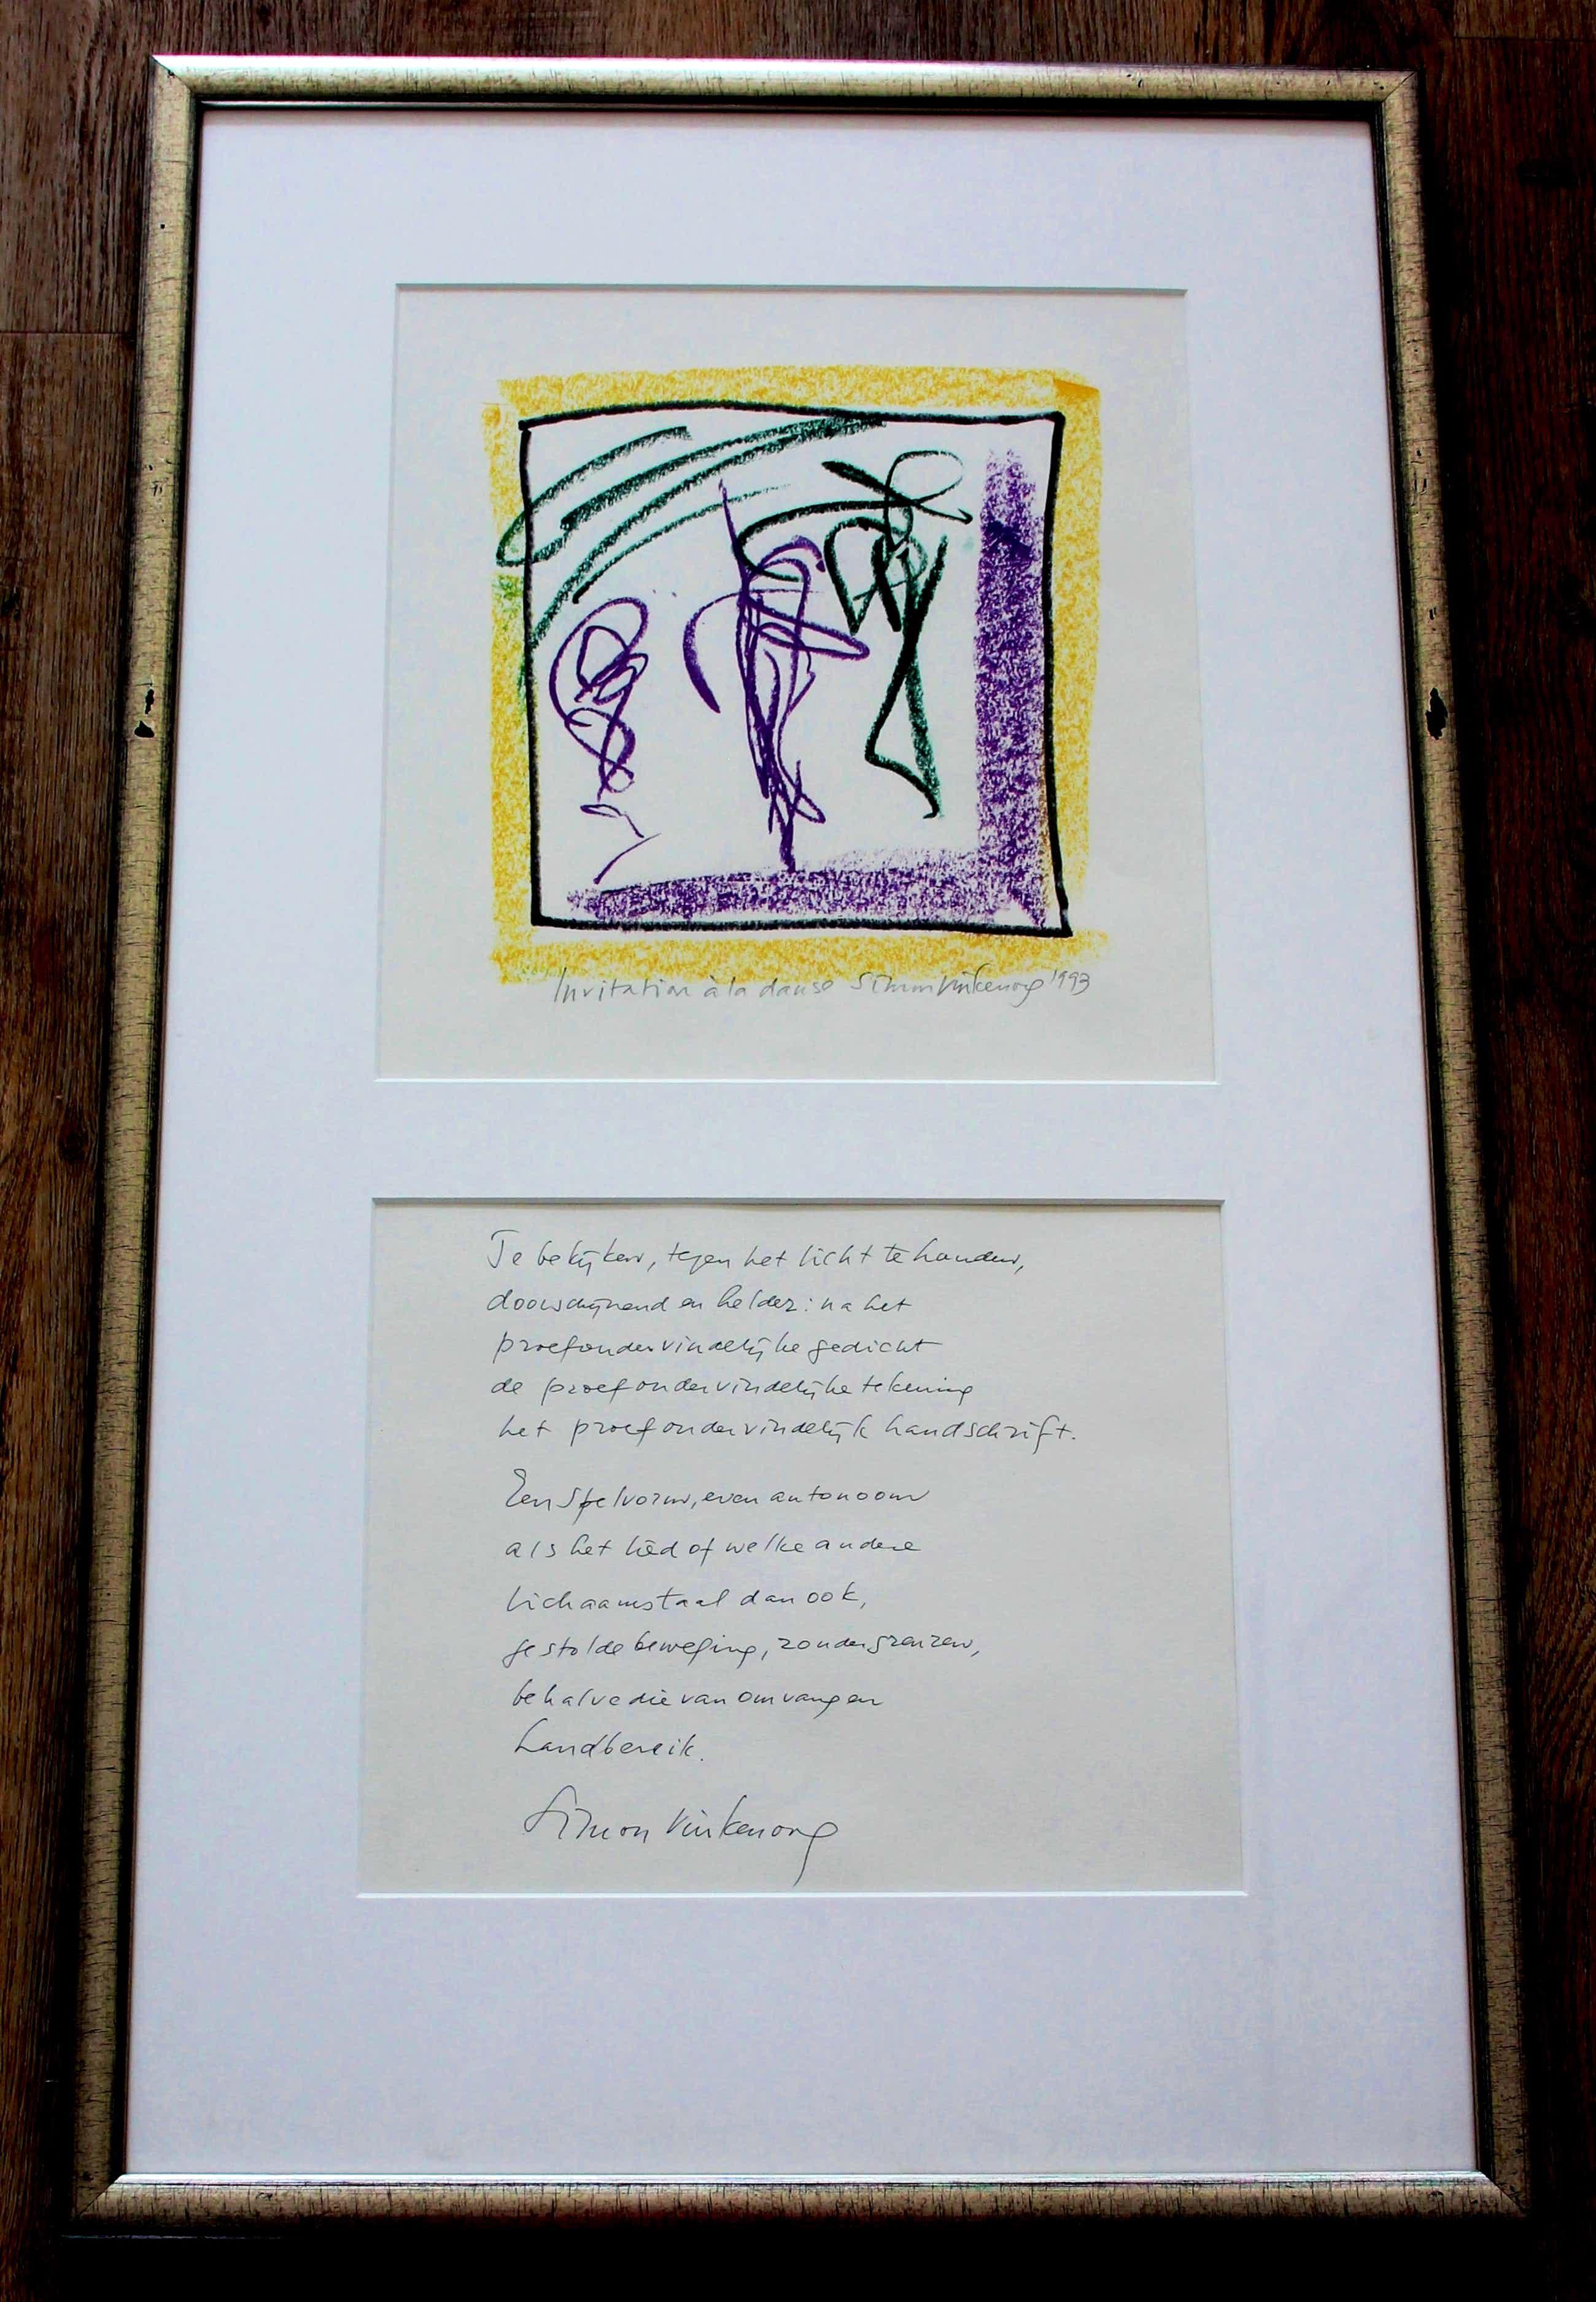 Simon Vinkenoog - Ingelijste krijttekening + gedicht: Invitation a la danse - 1993 kopen? Bied vanaf 149!